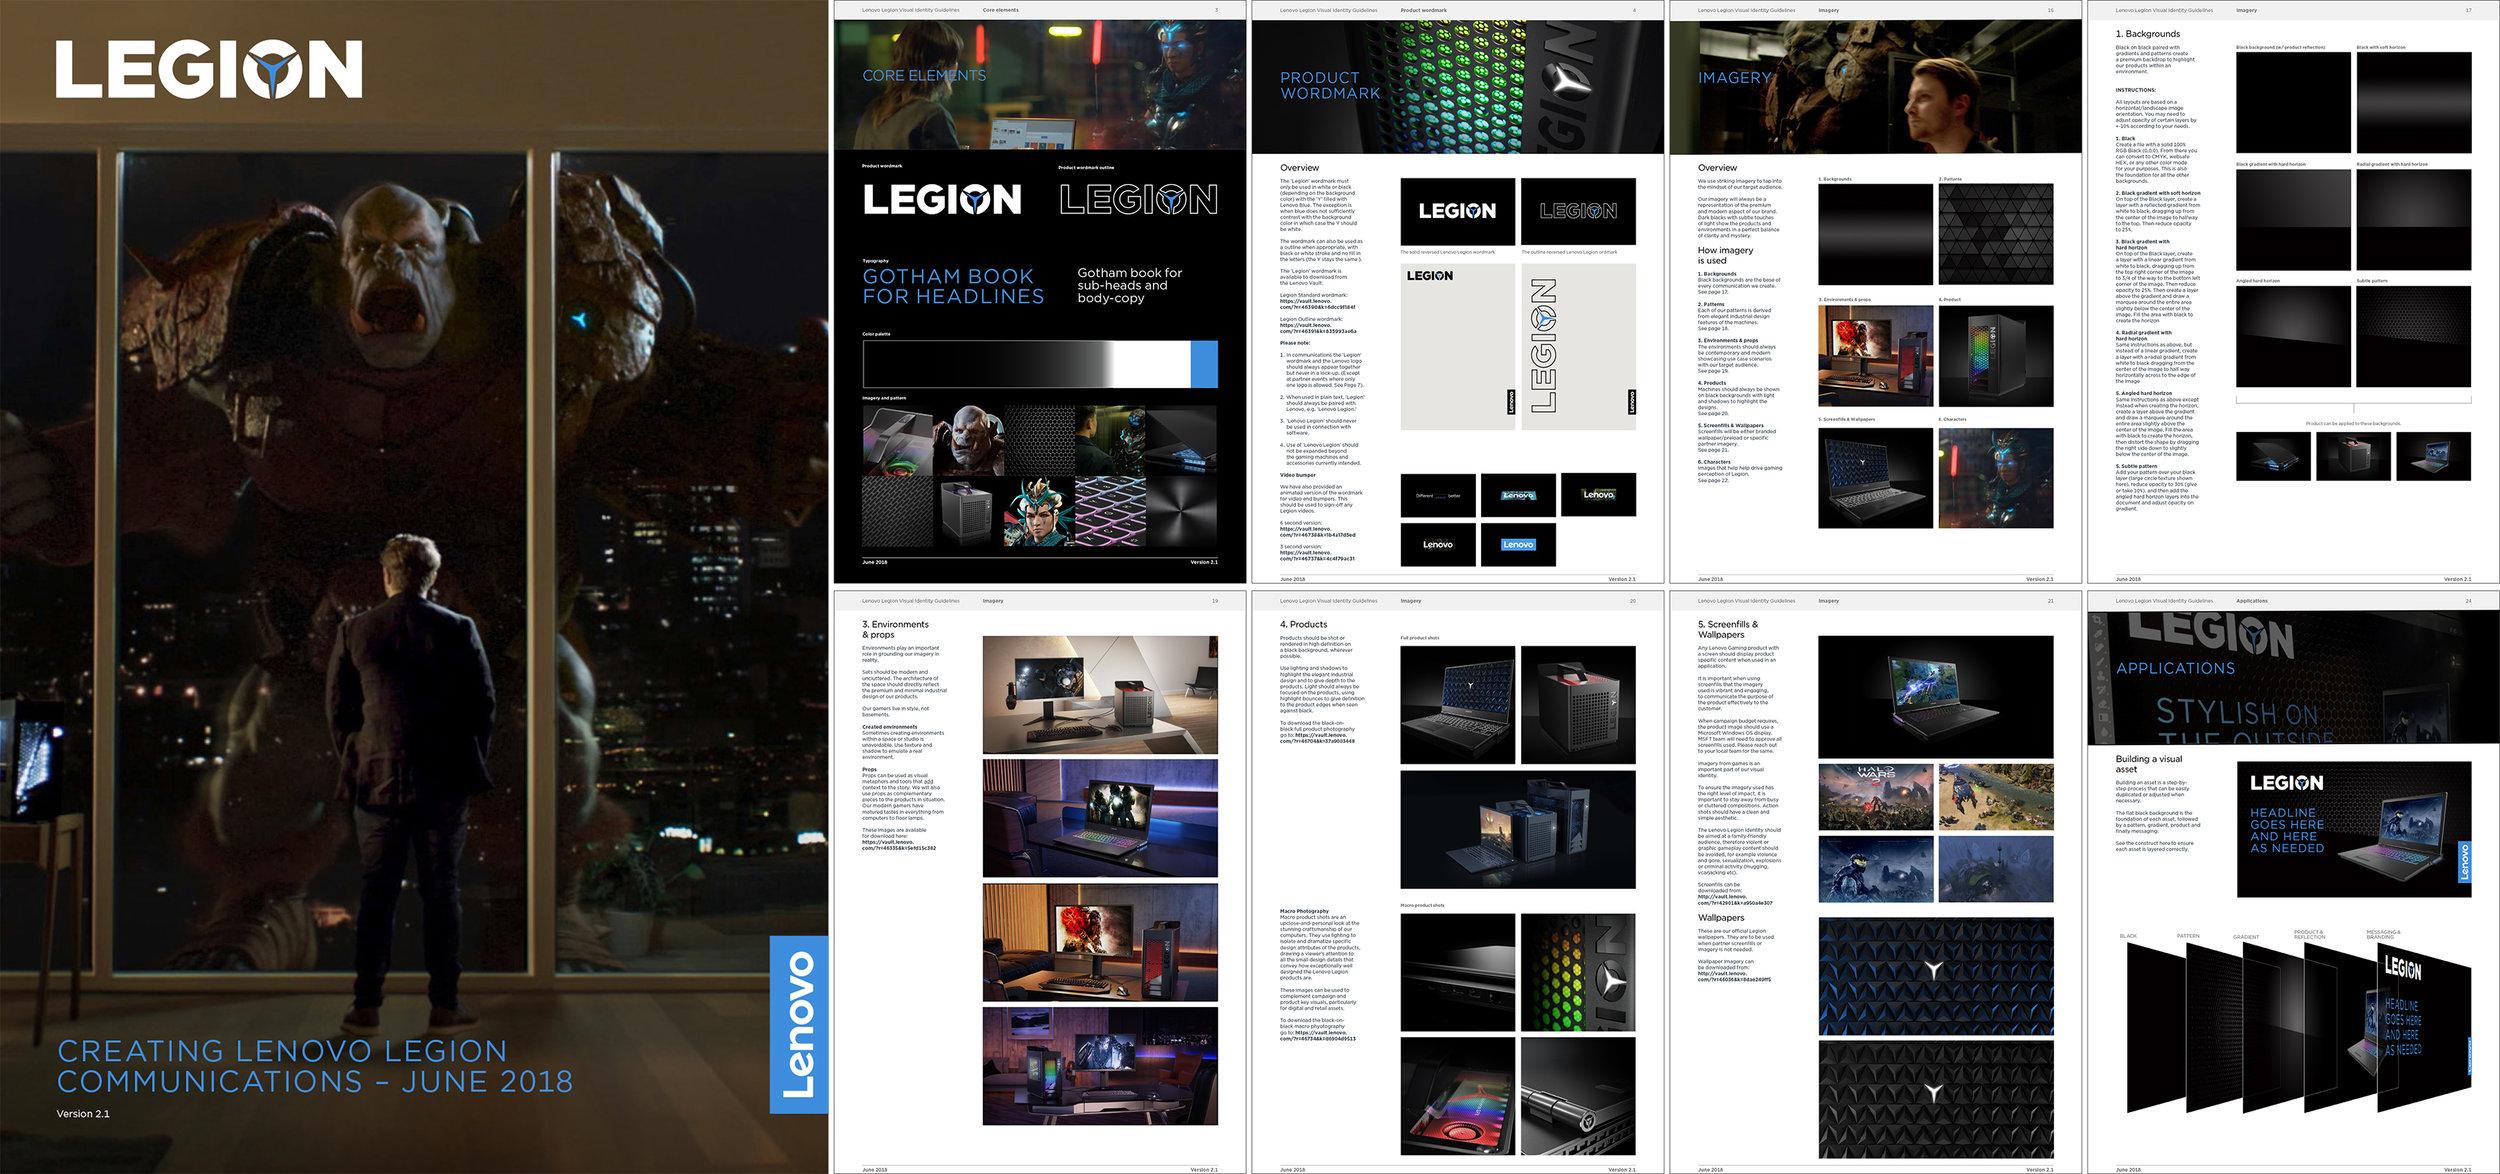 Legion-guides-1.jpg